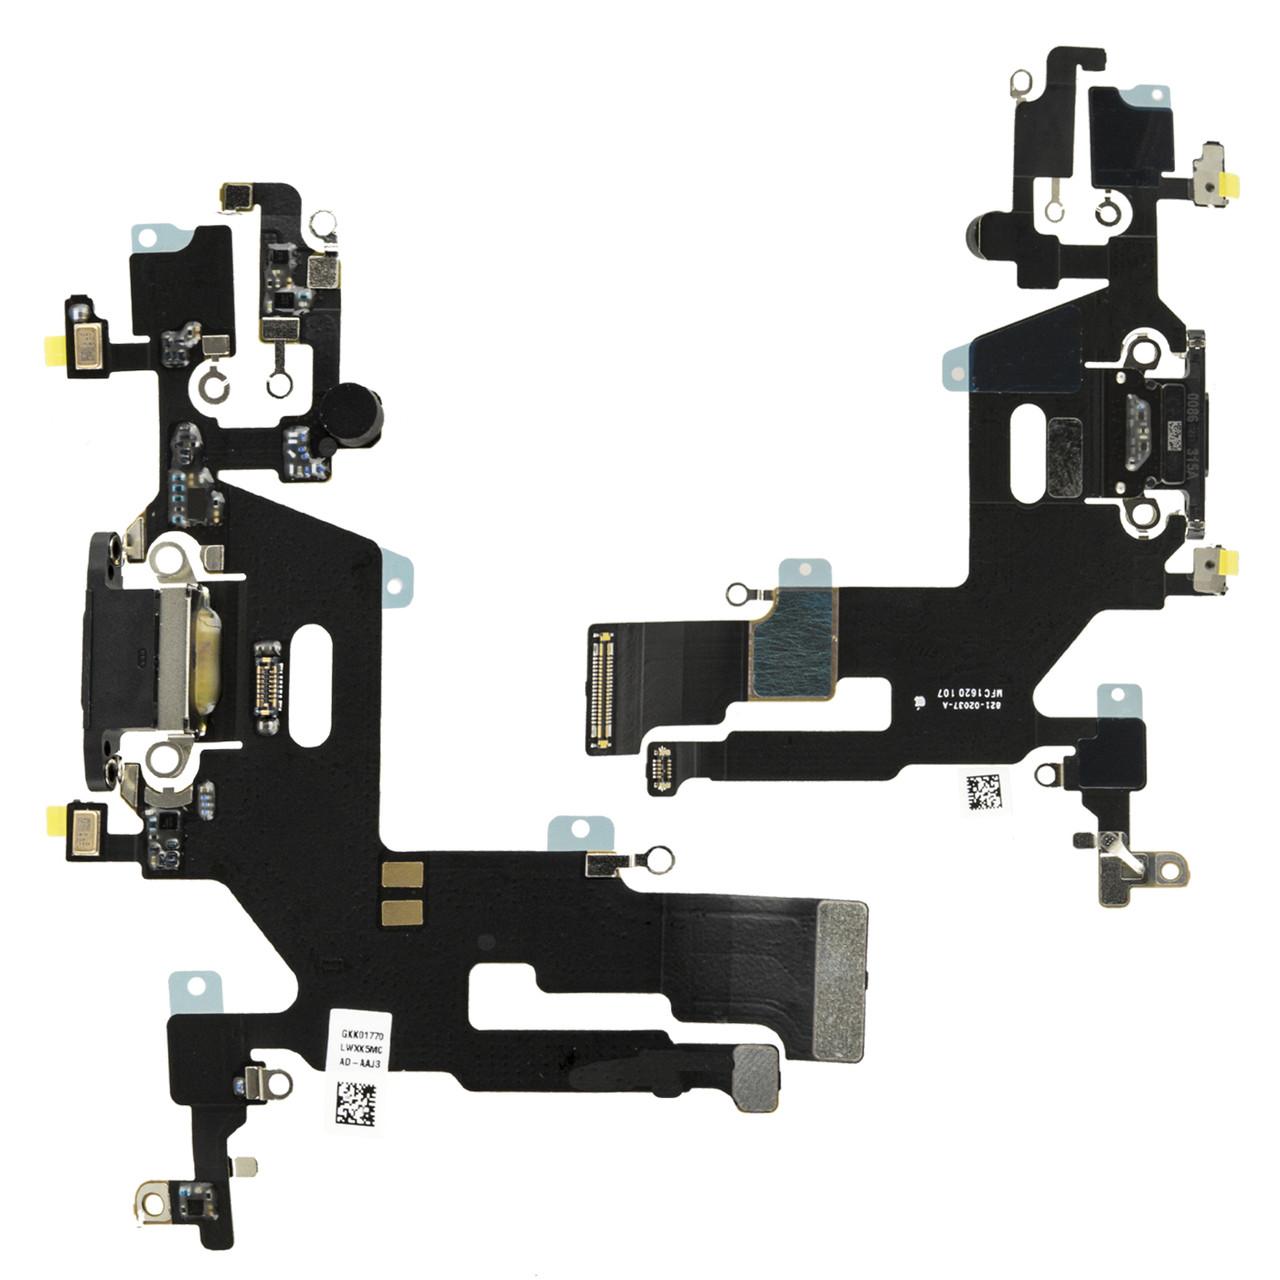 Шлейф Apple iPhone 11 с коннектором заряда, Black